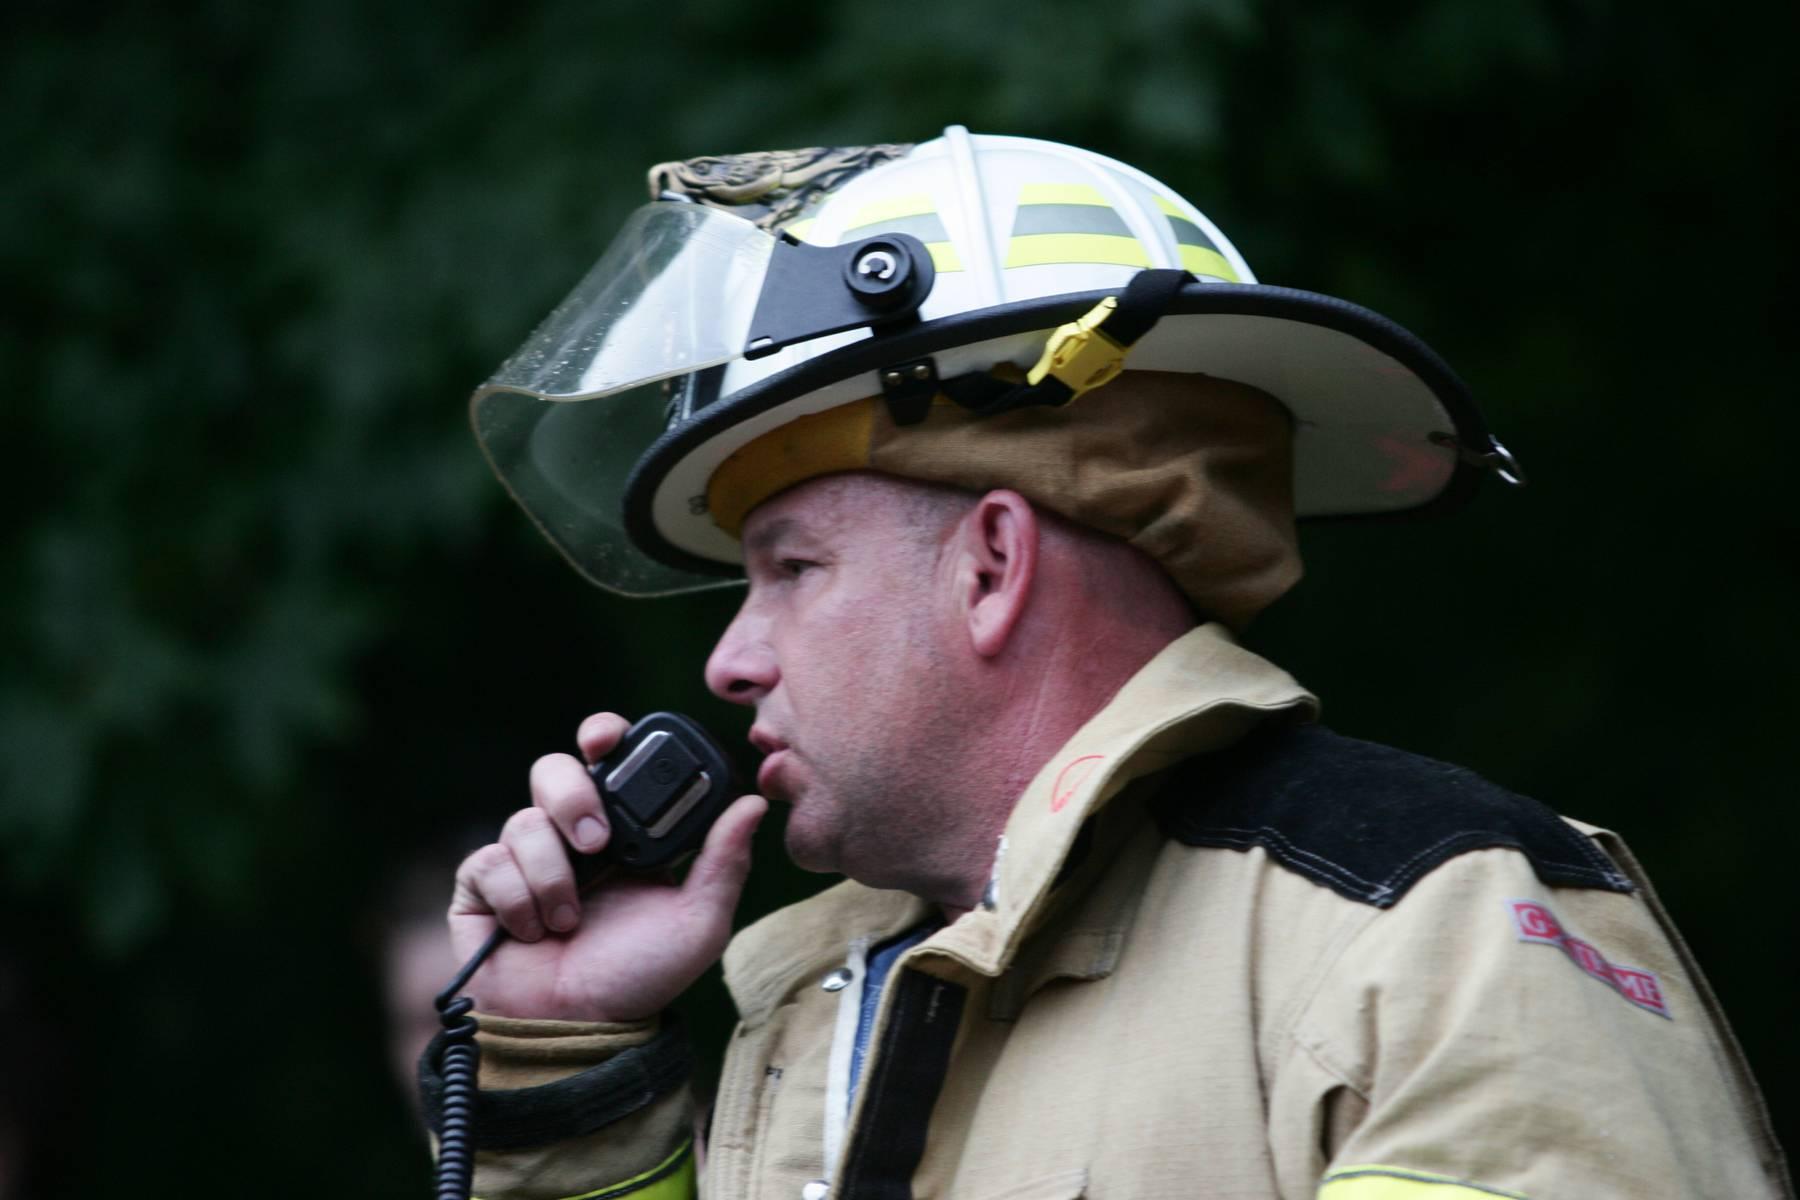 Sharon Volunteer Fire & Ambulance